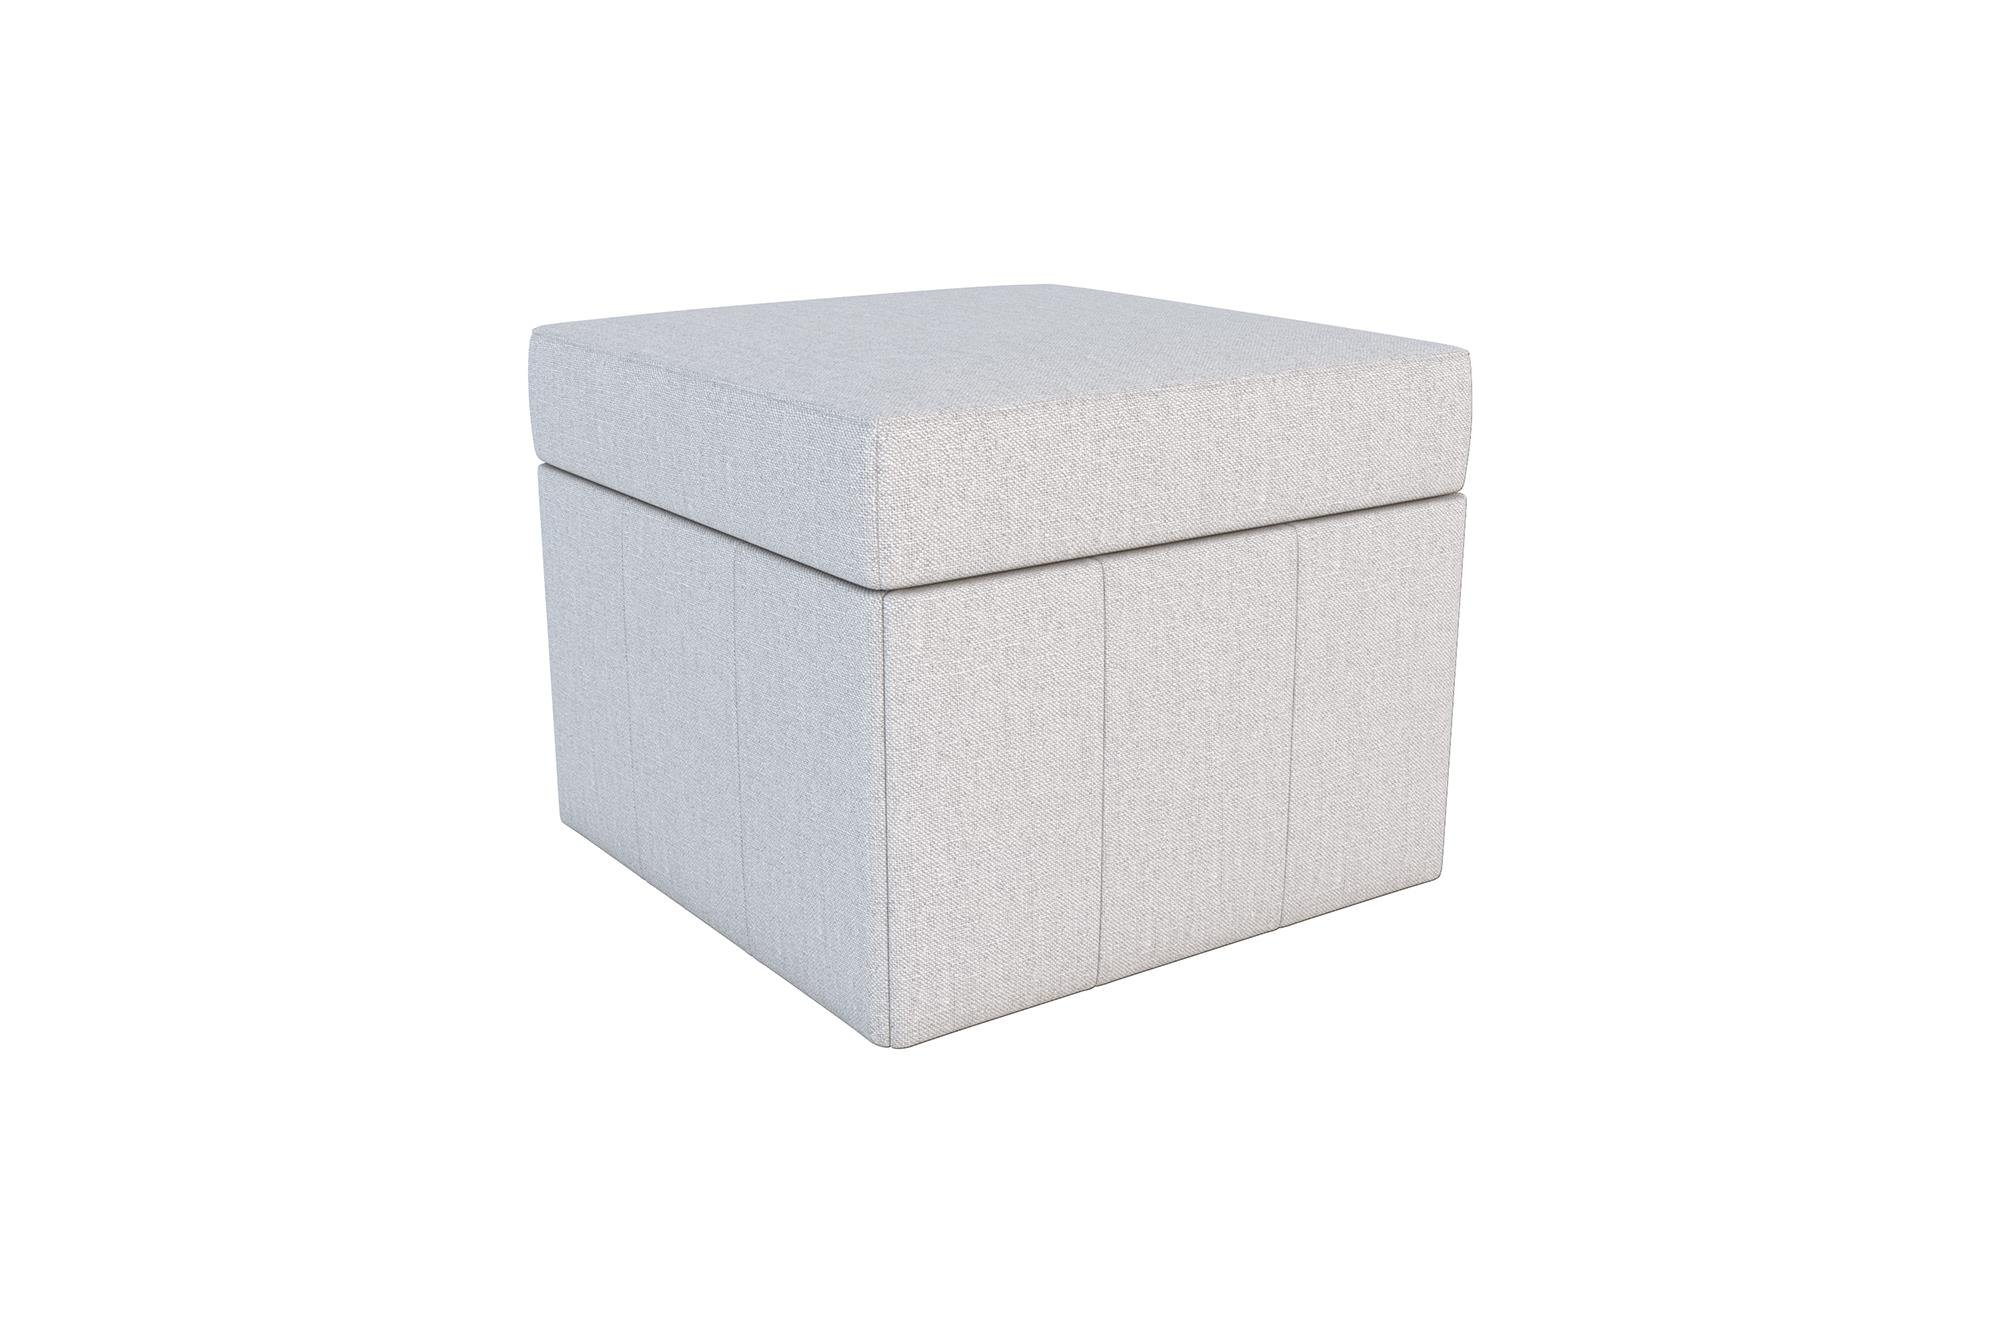 Novogratz Brittany Square Storage Ottoman, Premium Linen Upholstery, Lightweight, Grey Linen